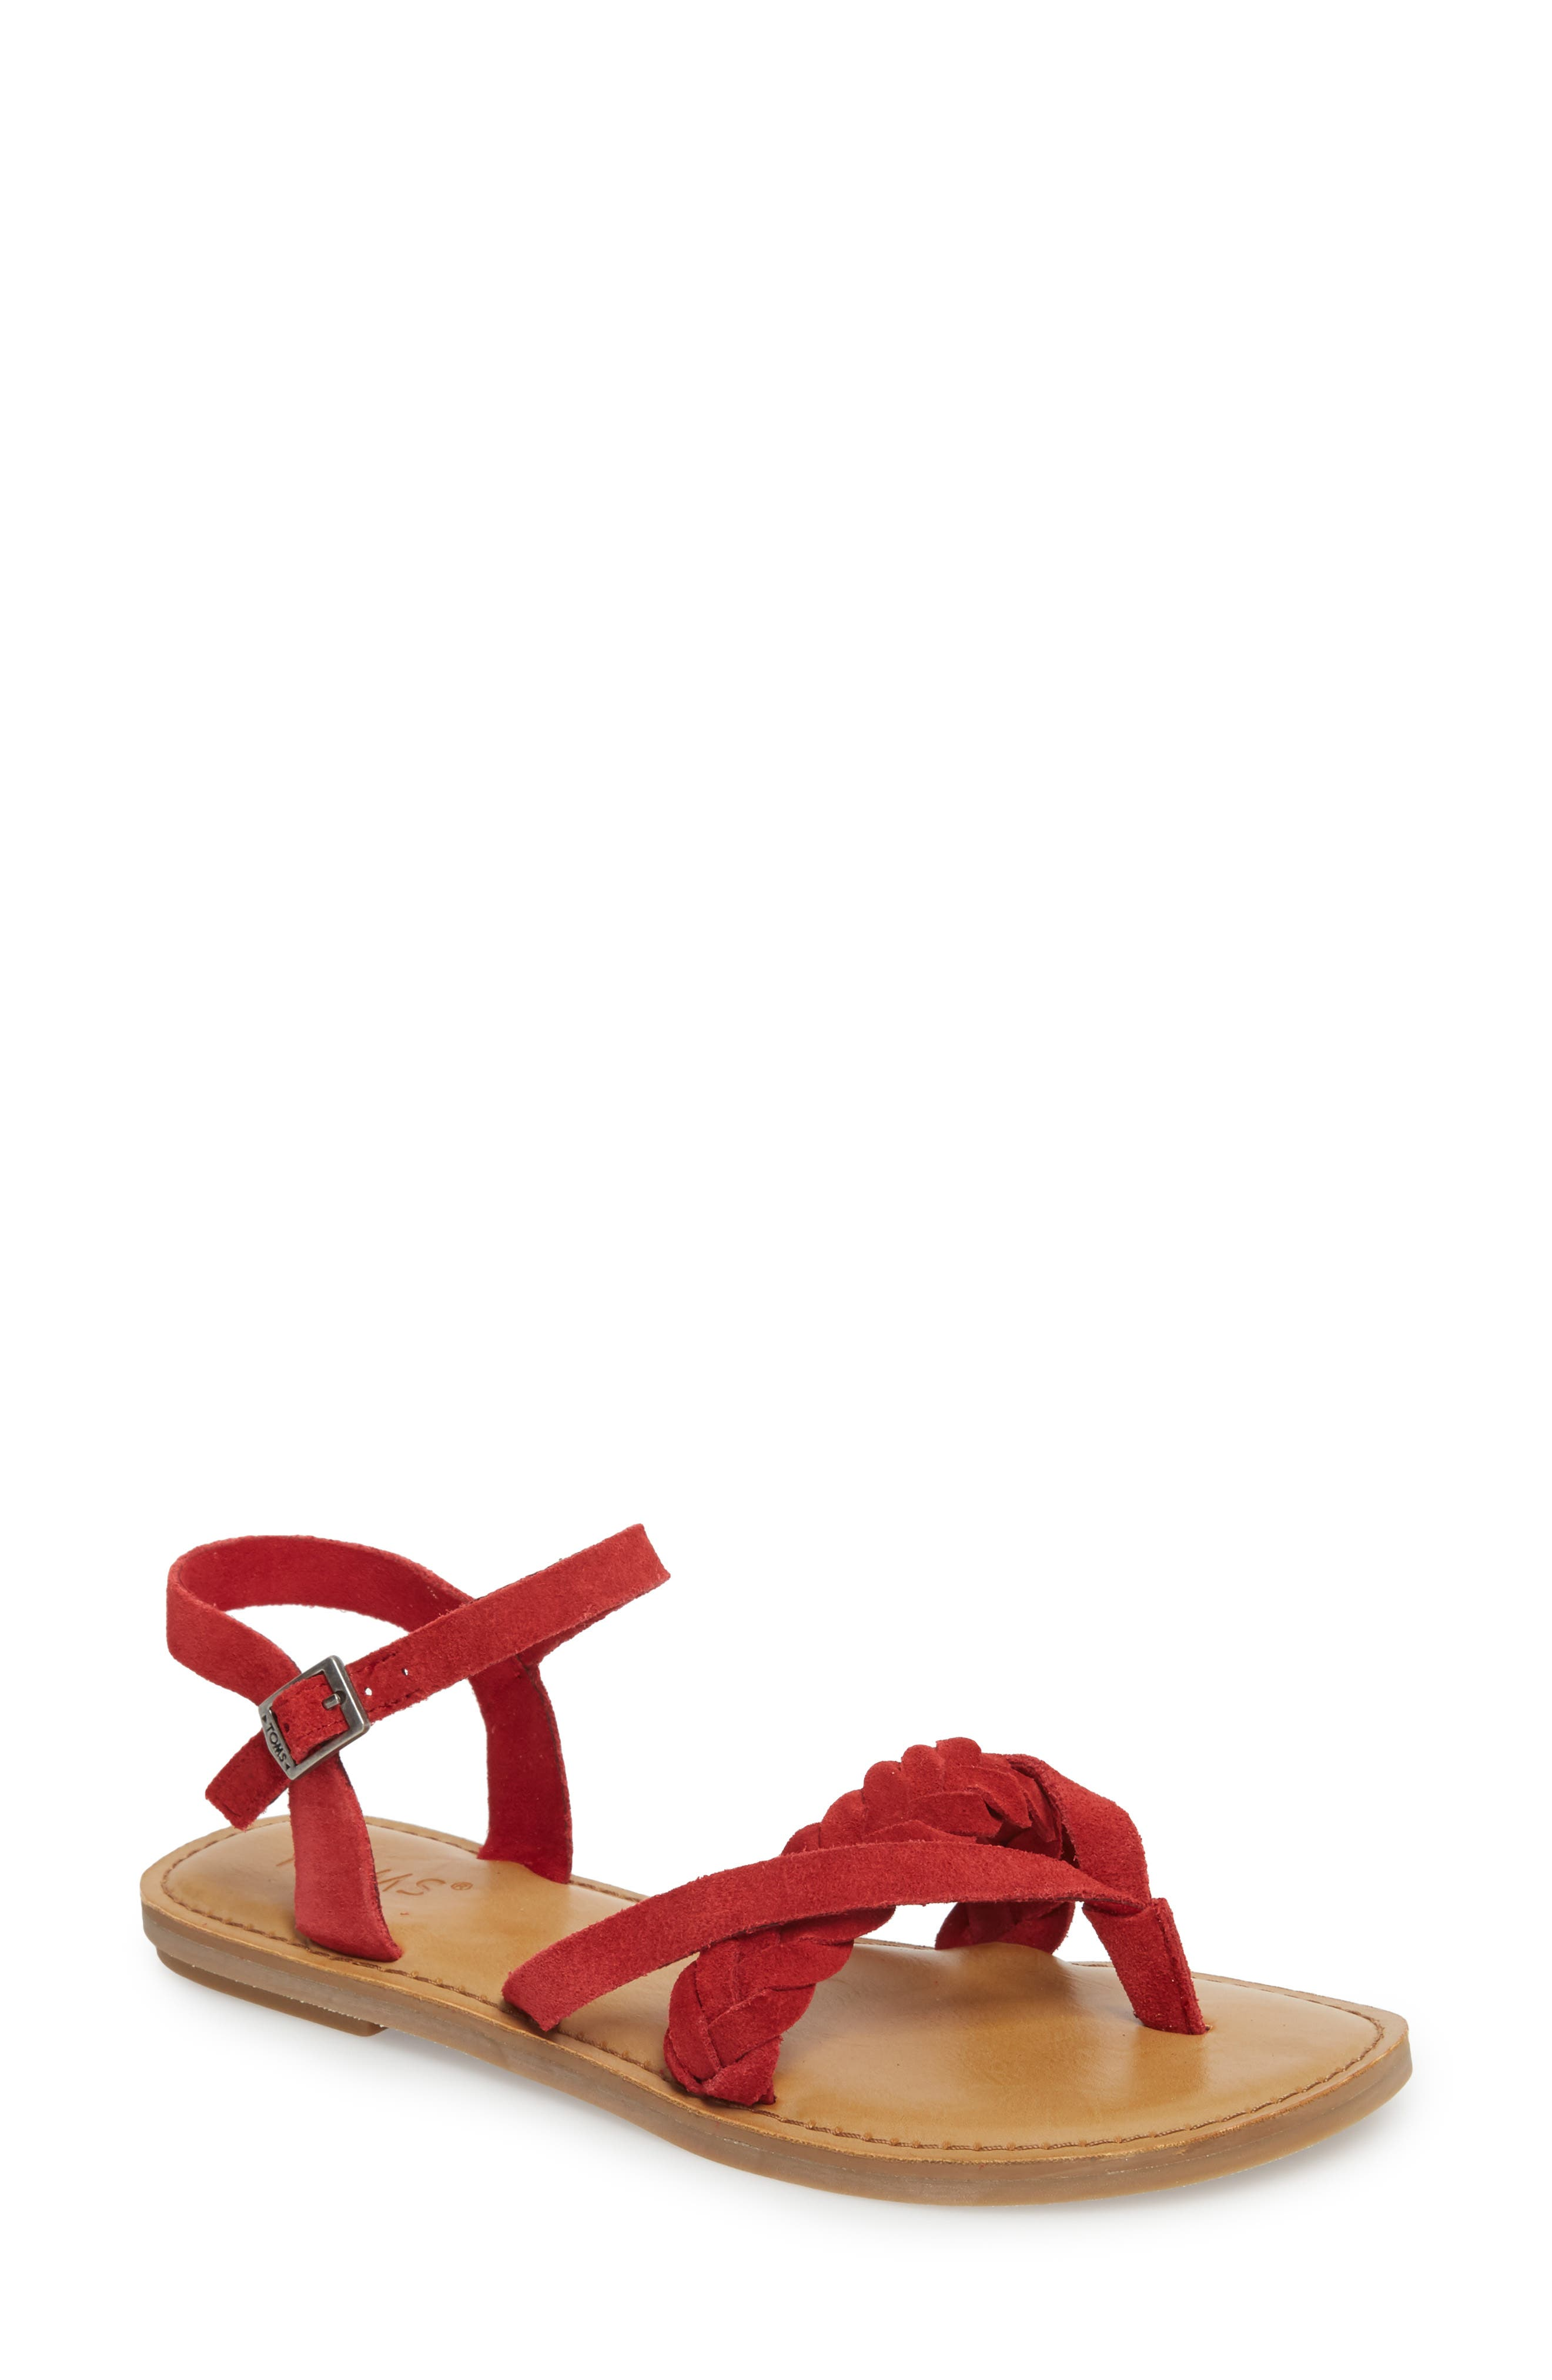 'Lexie' Sandal,                         Main,                         color, 601